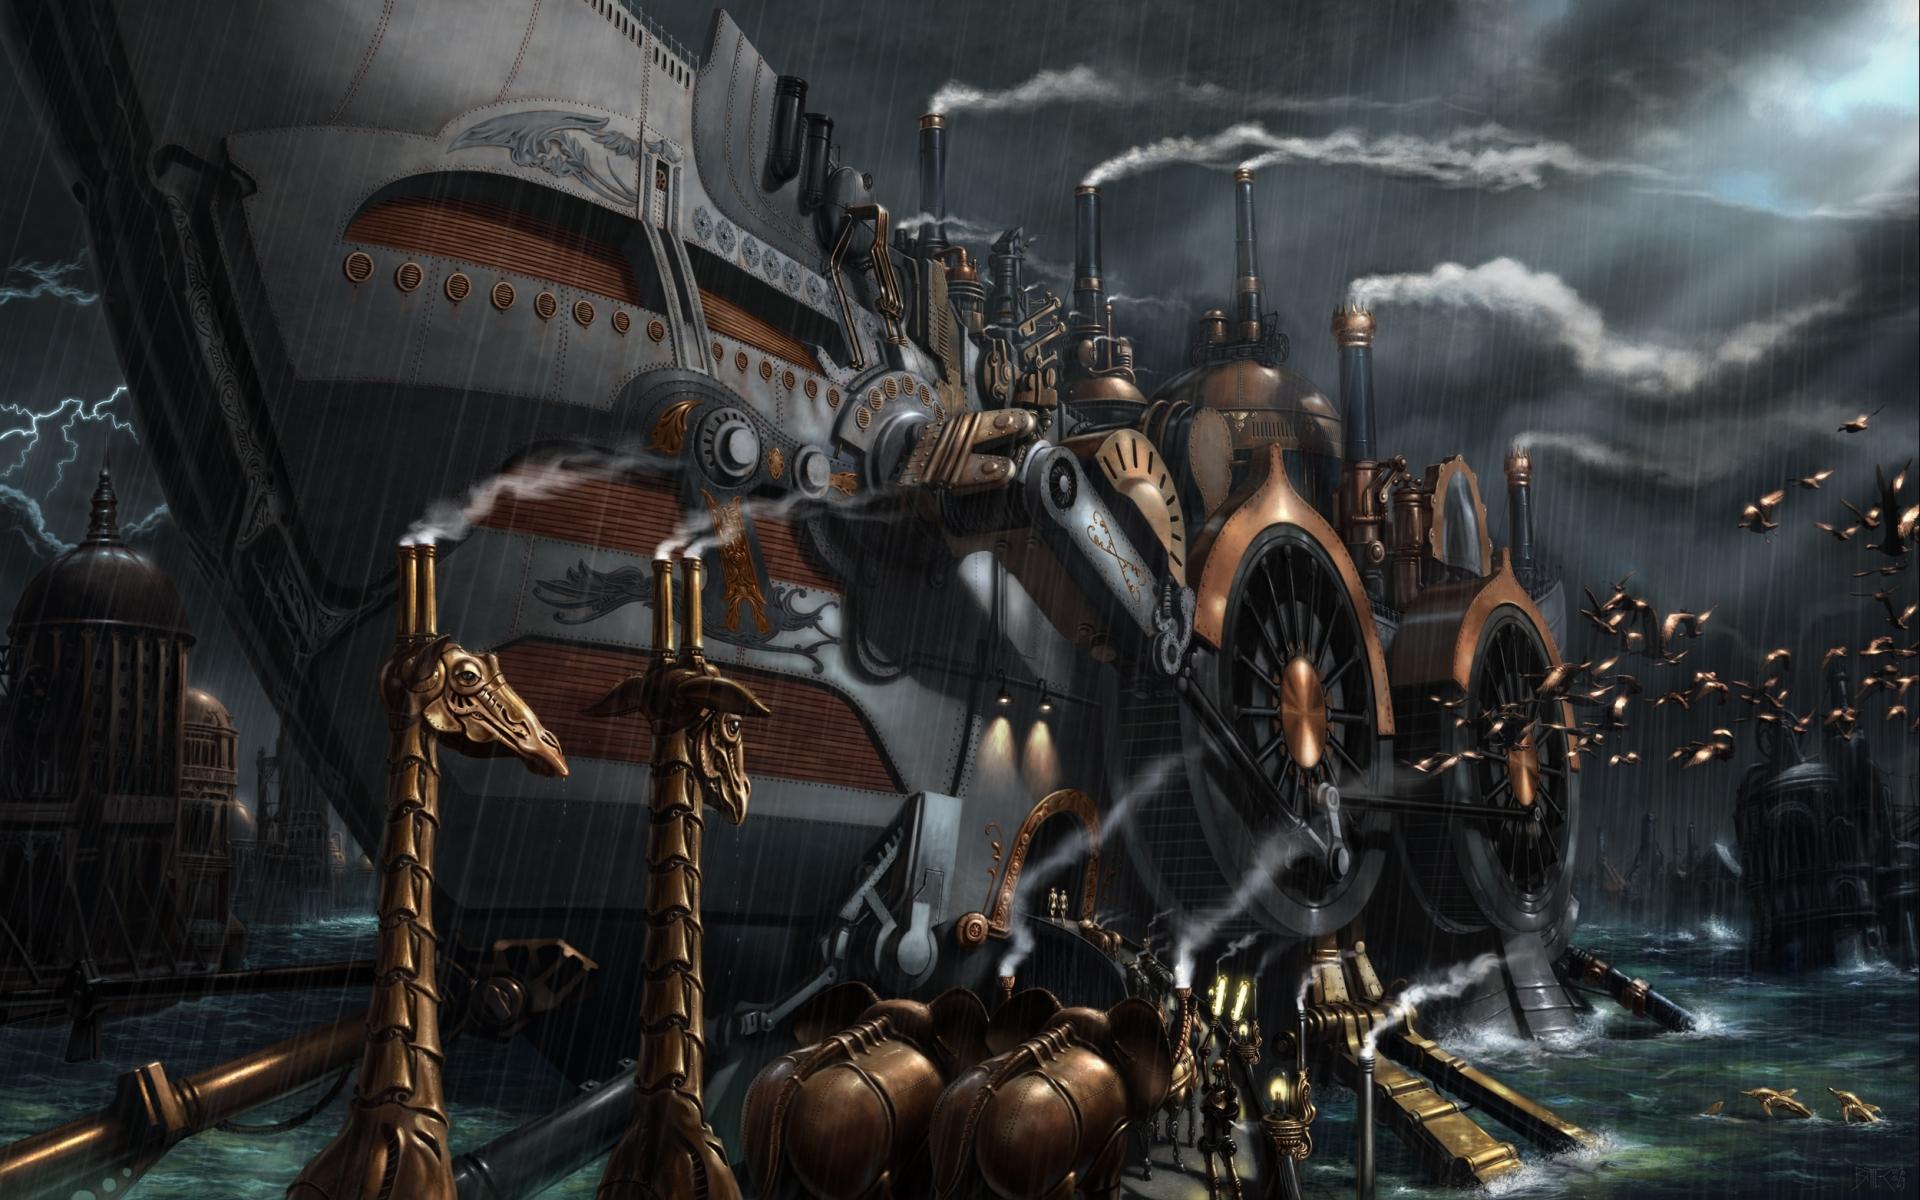 naval-ship-steampunk-wallpaper.jpg